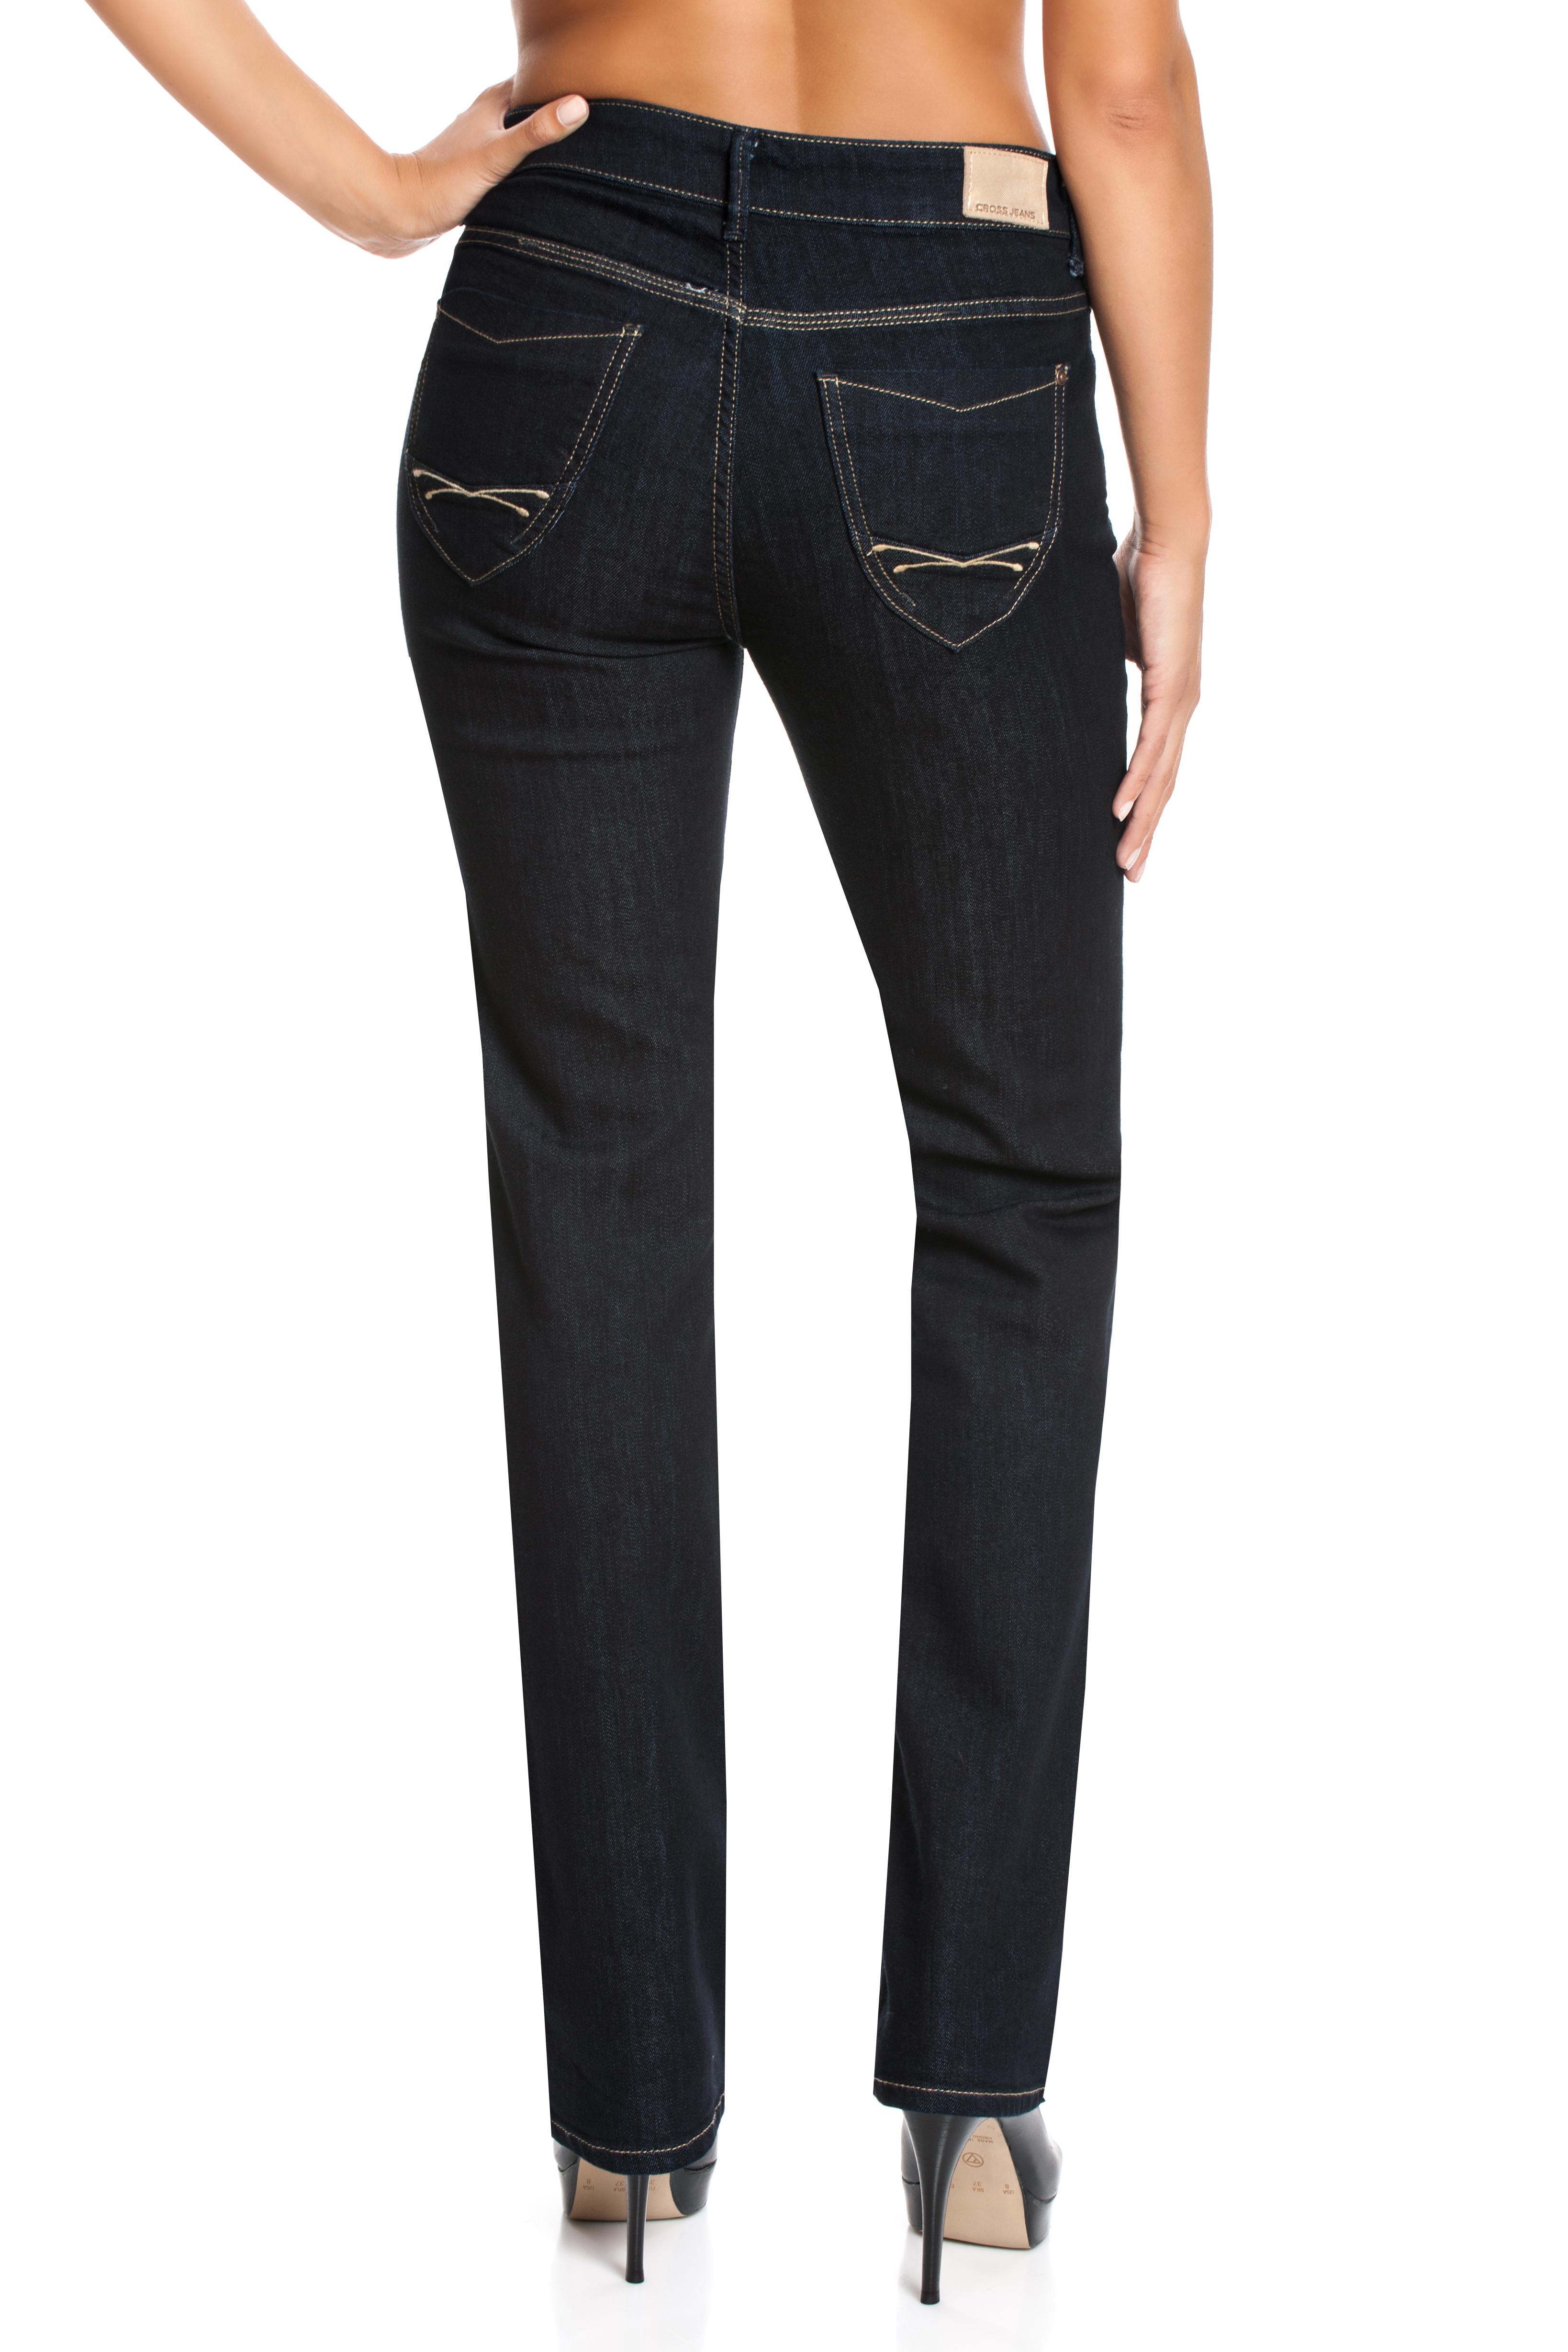 Cross Rose Jeans